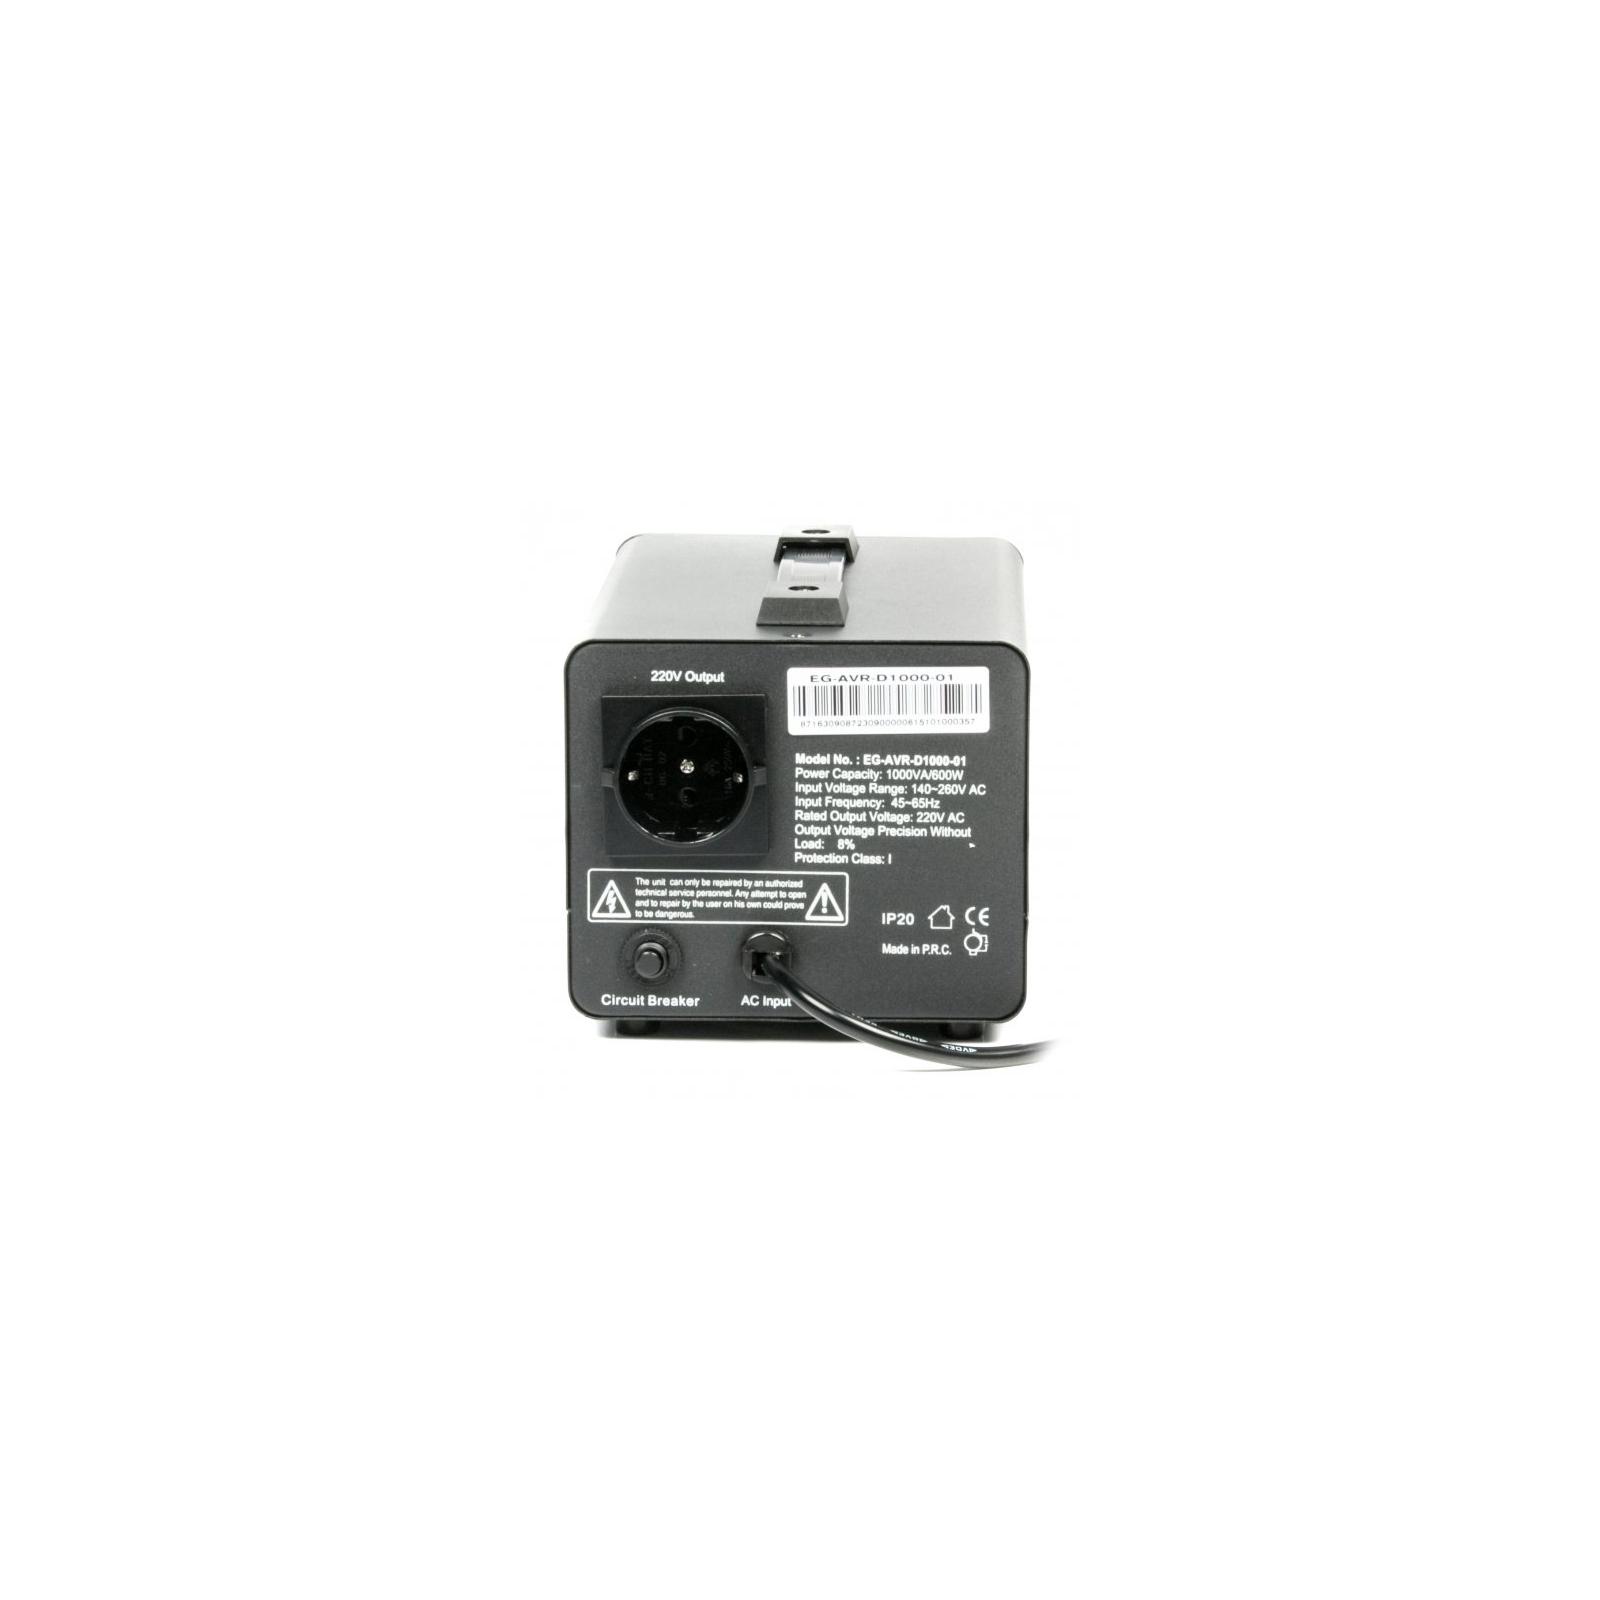 Стабилизатор EnerGenie EG-AVR-D1000-01, 600Вт (EG-AVR-D1000-01) изображение 2